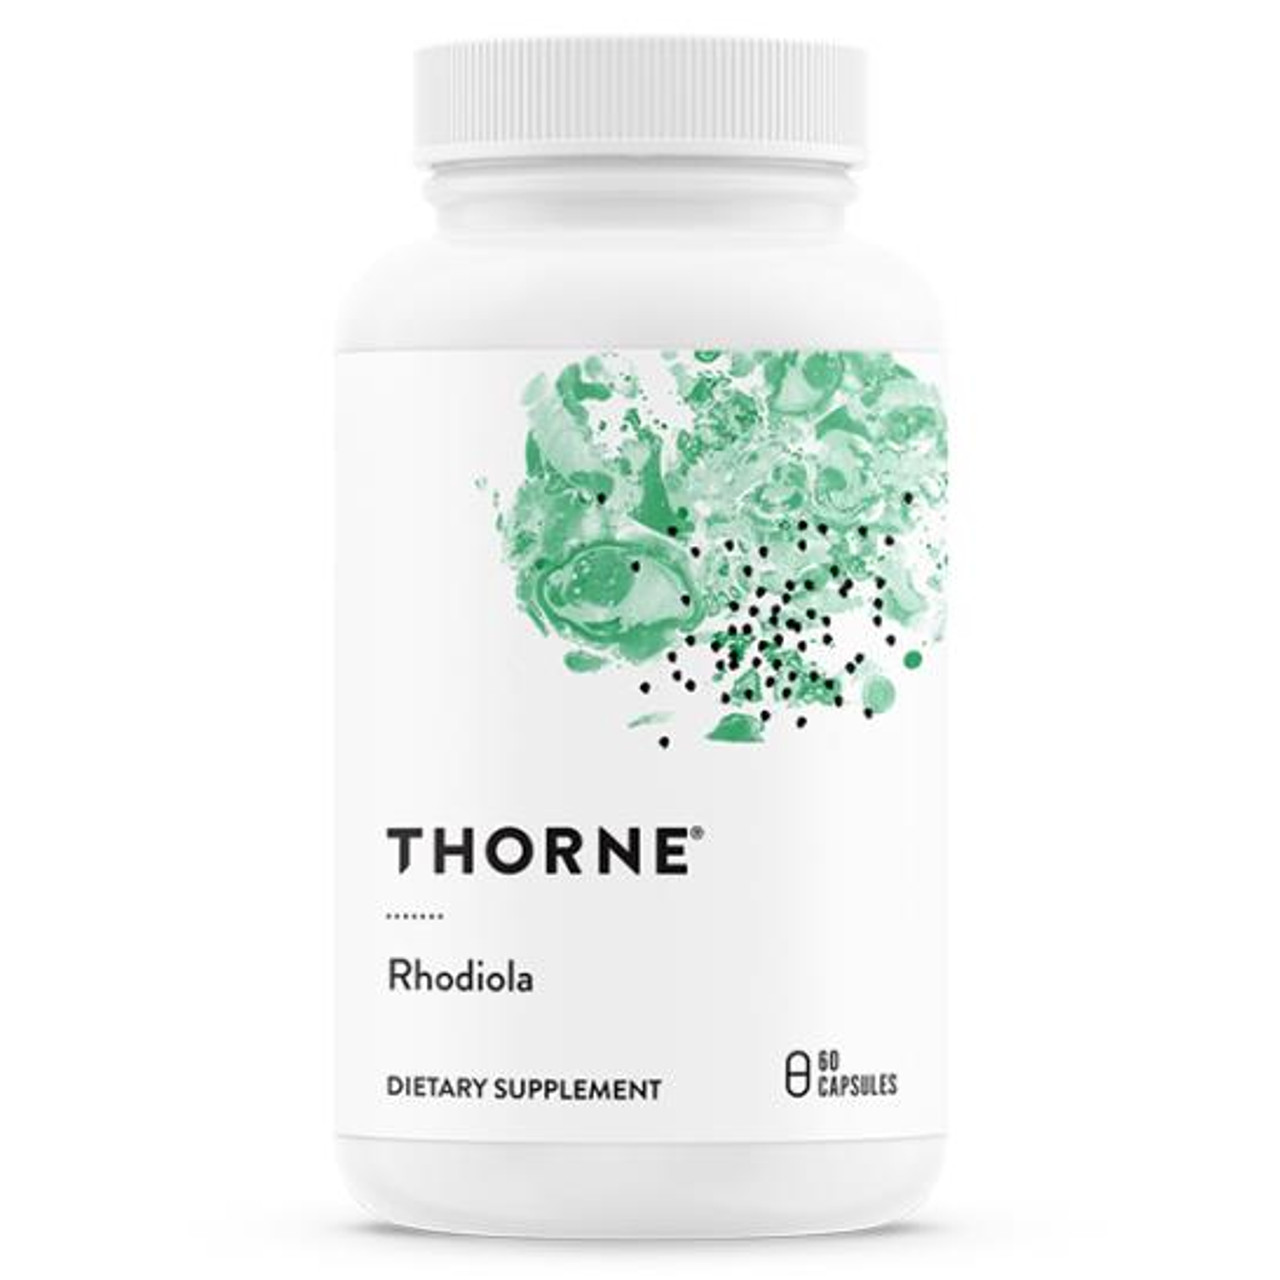 Rhodiola 60 Caps (100 mg)